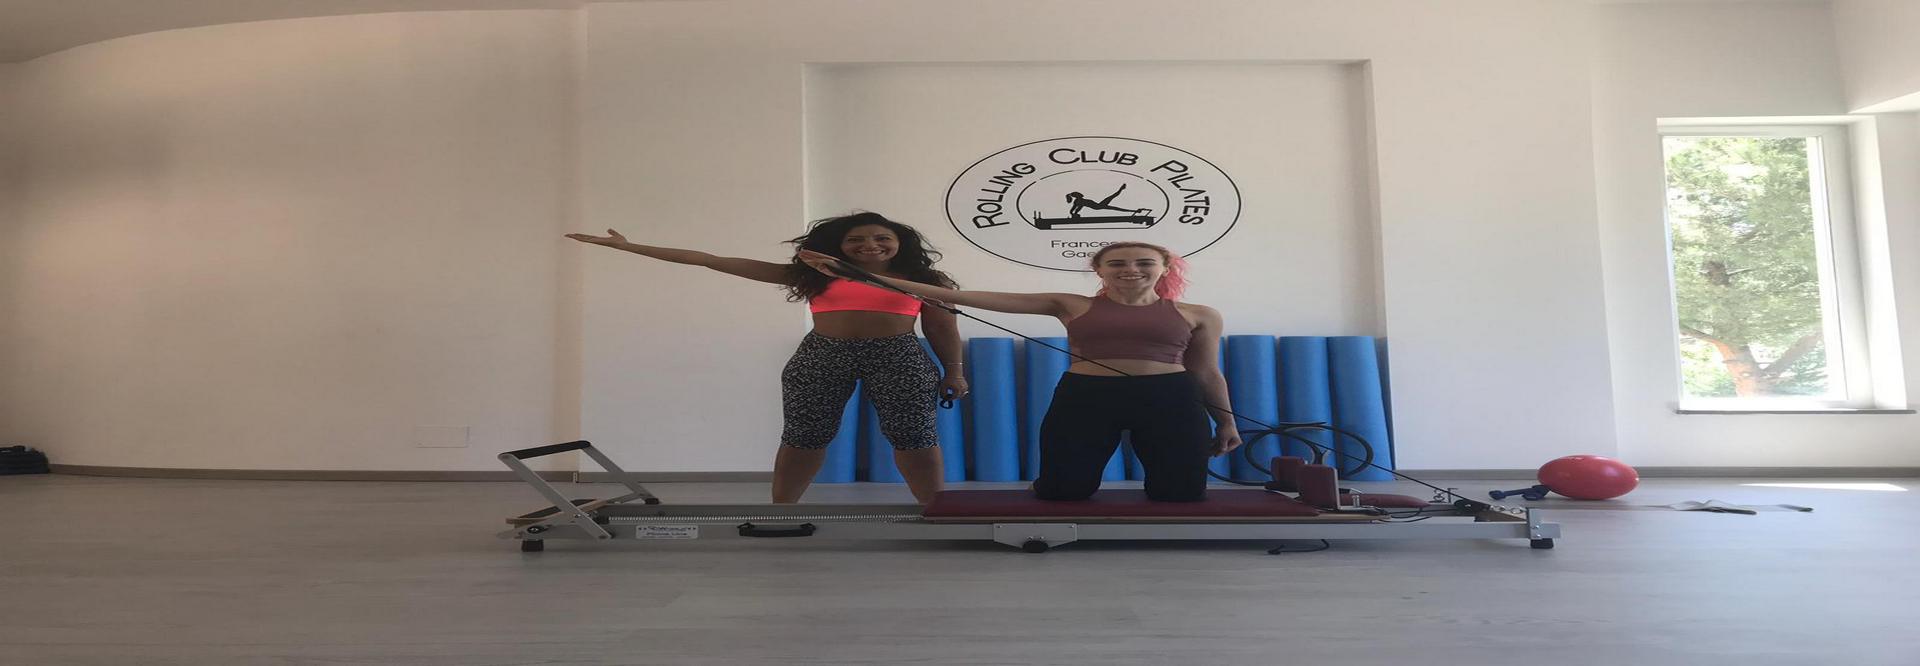 App Palestre Xeniasoft - Rolling Club Pilates